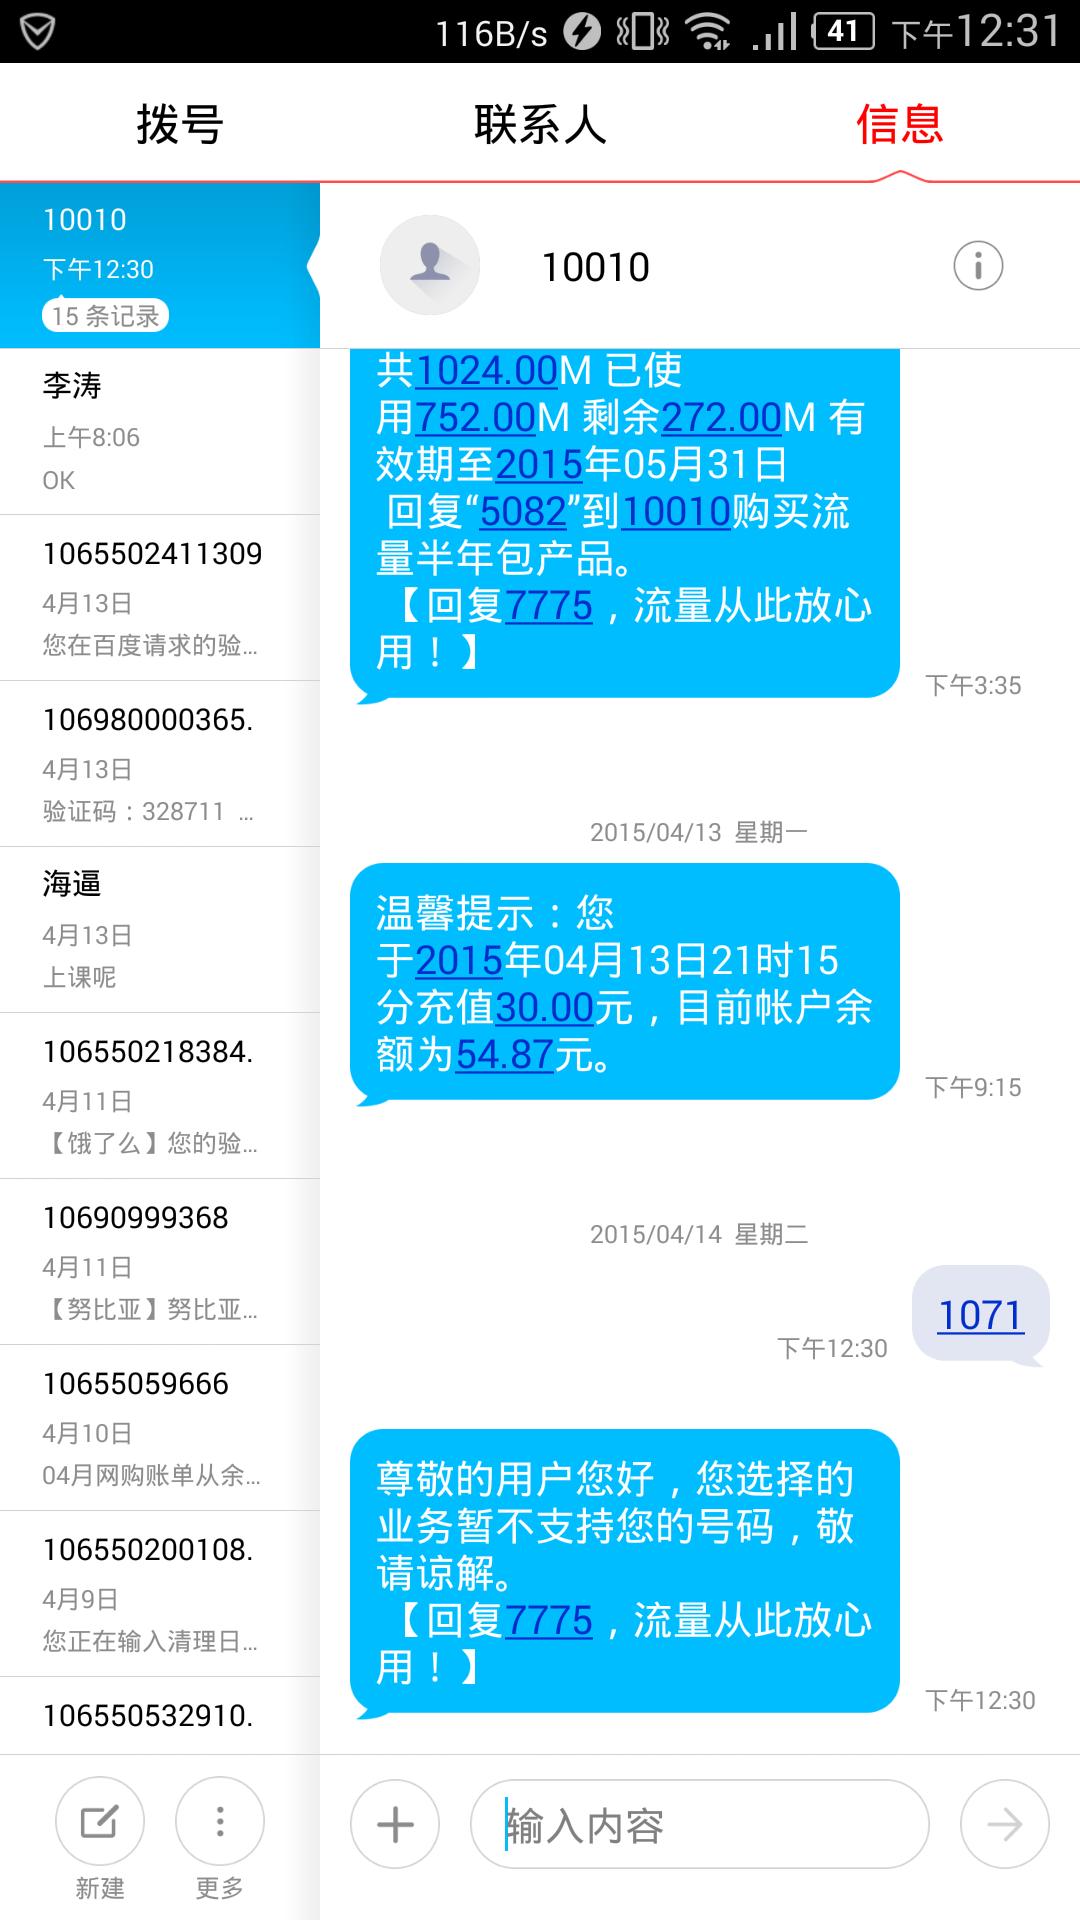 Screenshot_2015-04-14-12-31-41.png